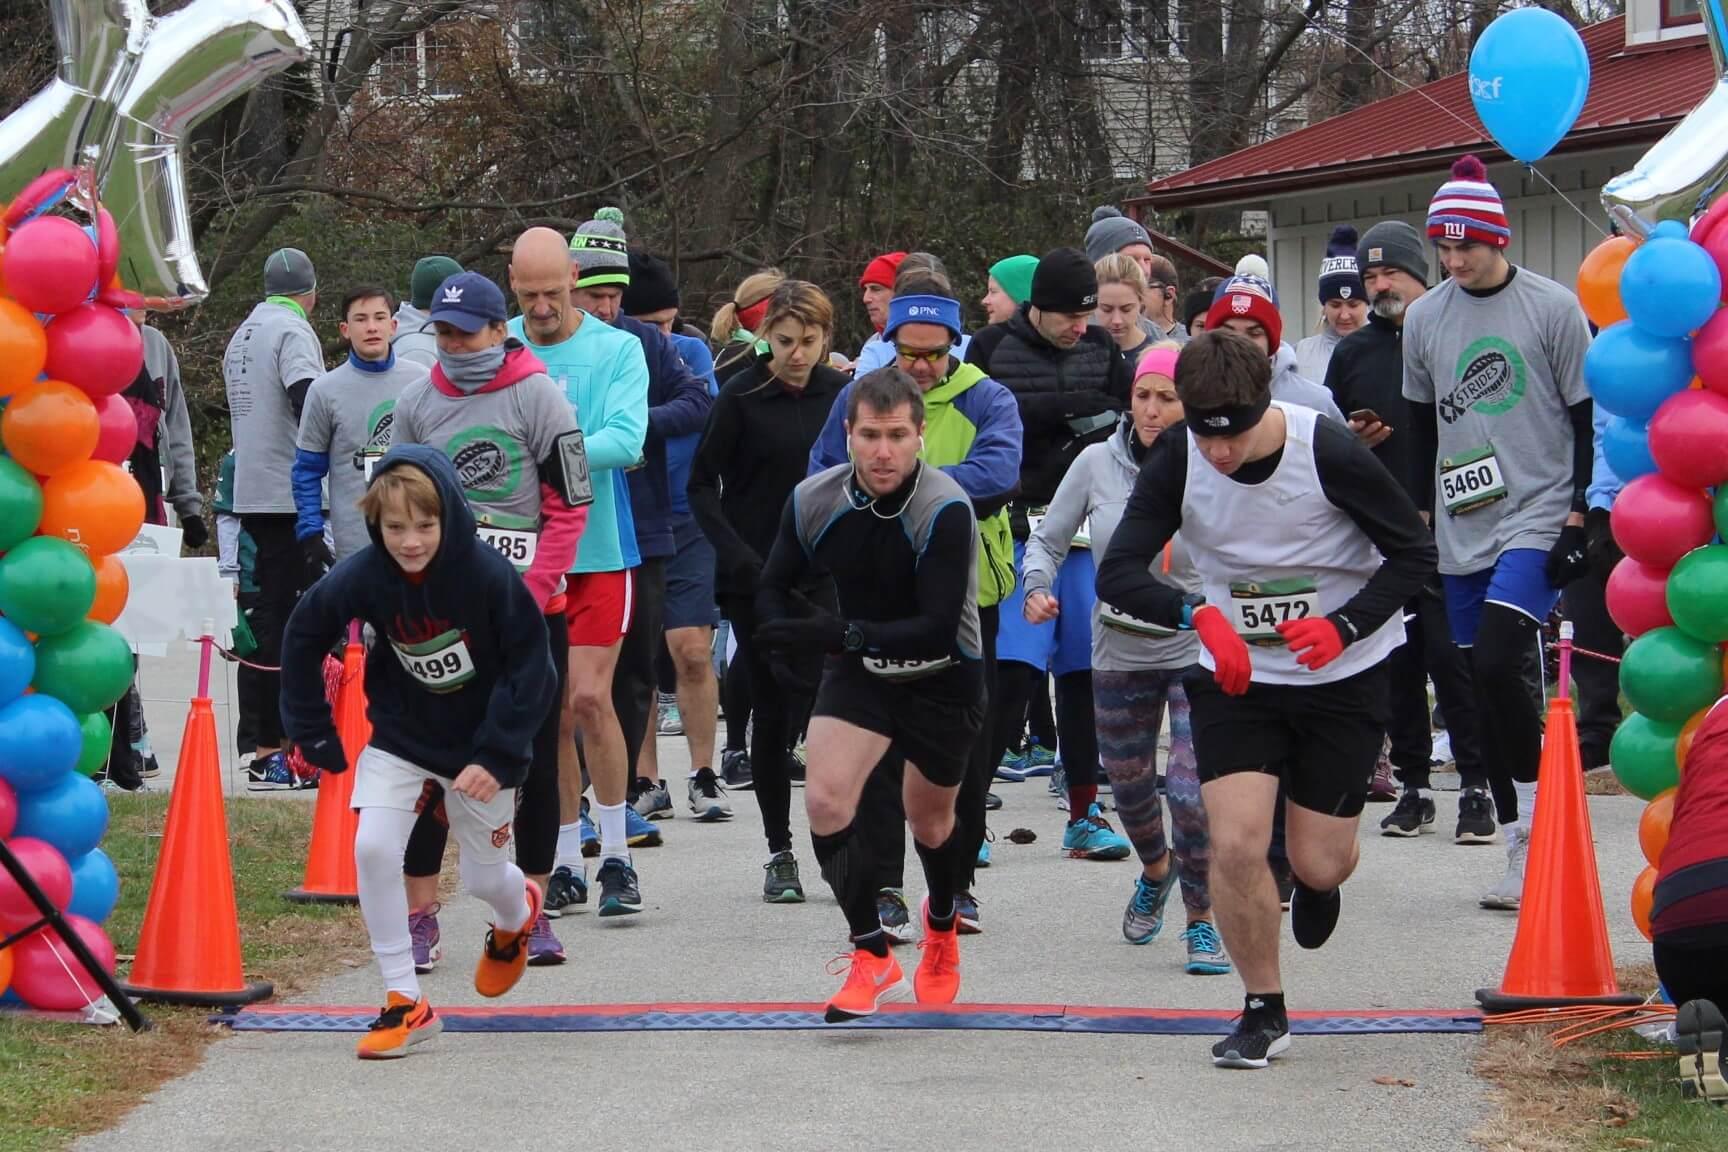 3 runners starting race